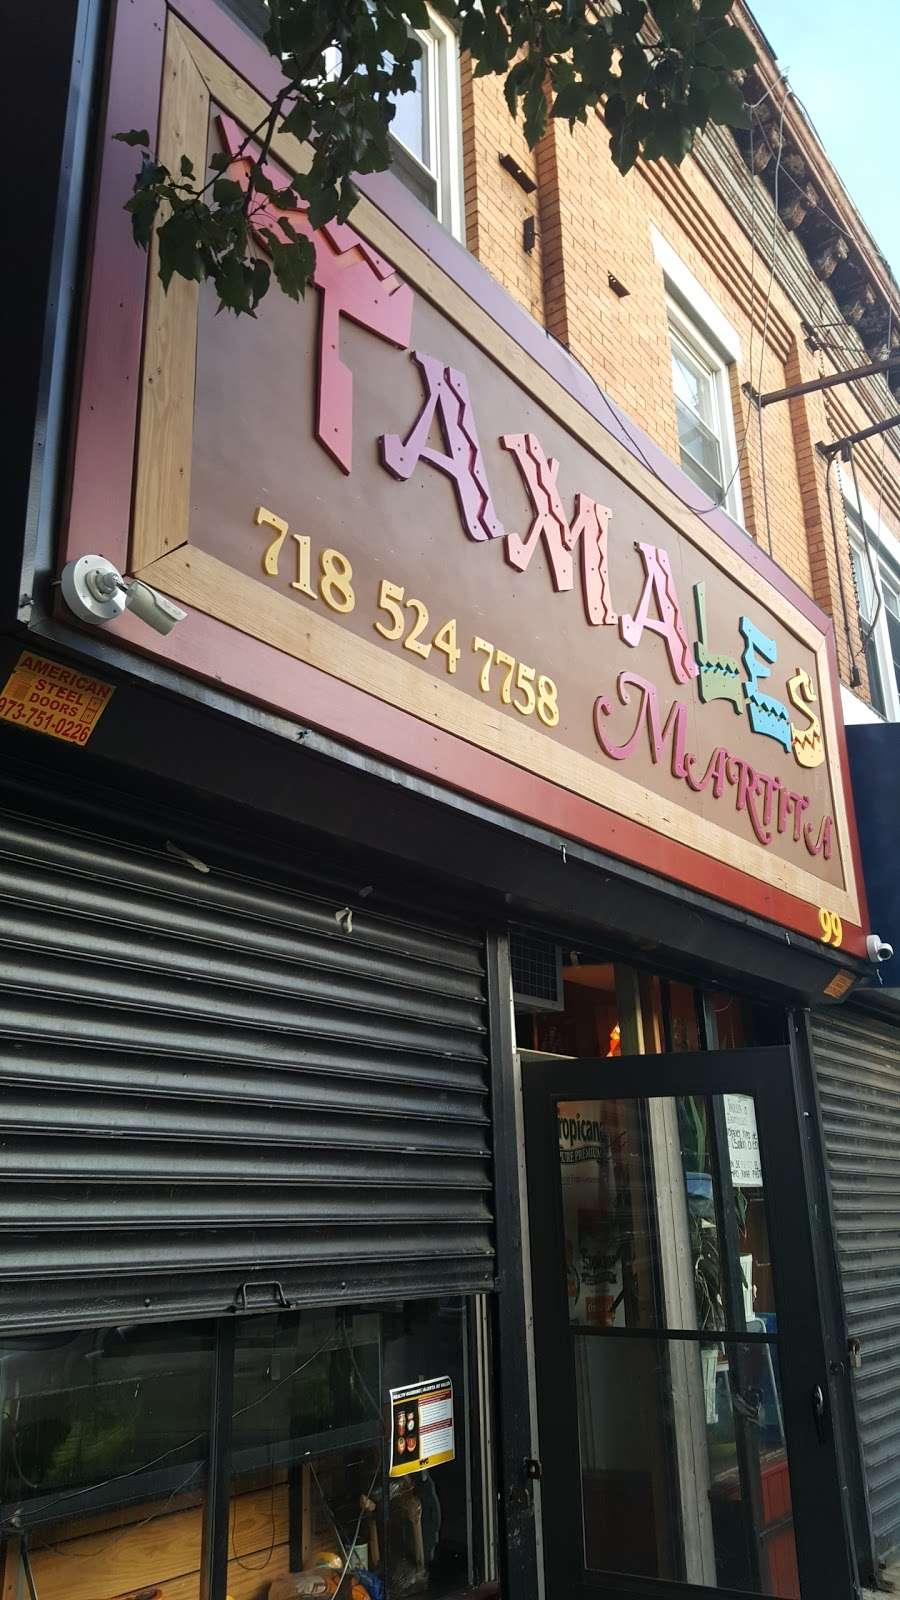 Mexican Tamales Martita - restaurant    Photo 3 of 10   Address: 99 Port Richmond Ave, Staten Island, NY 10302, USA   Phone: (718) 524-7758